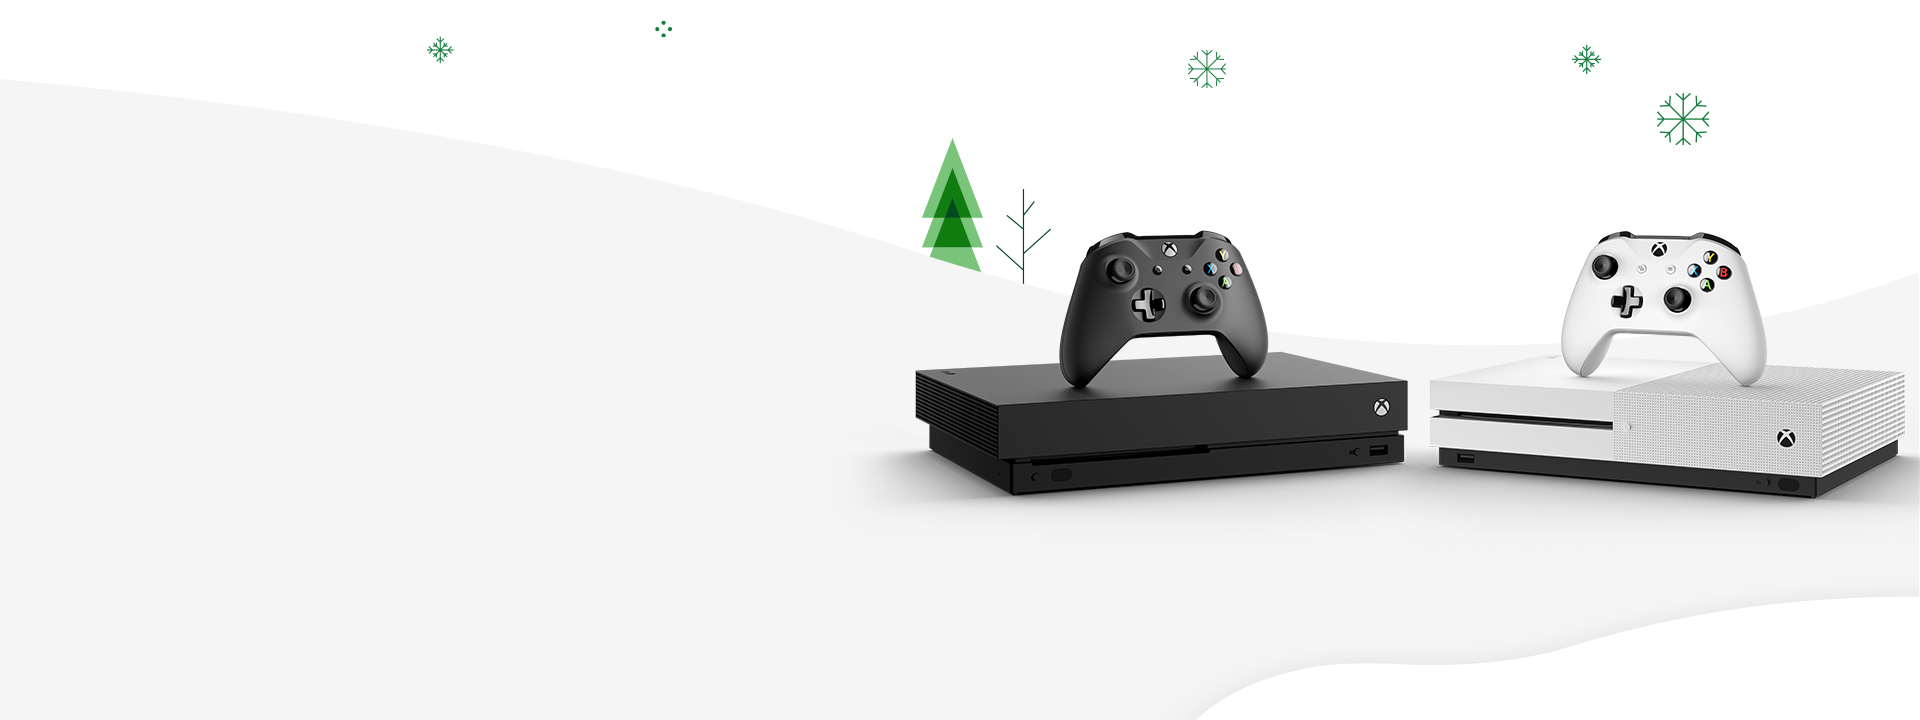 Save $80 on Xbox One bundles